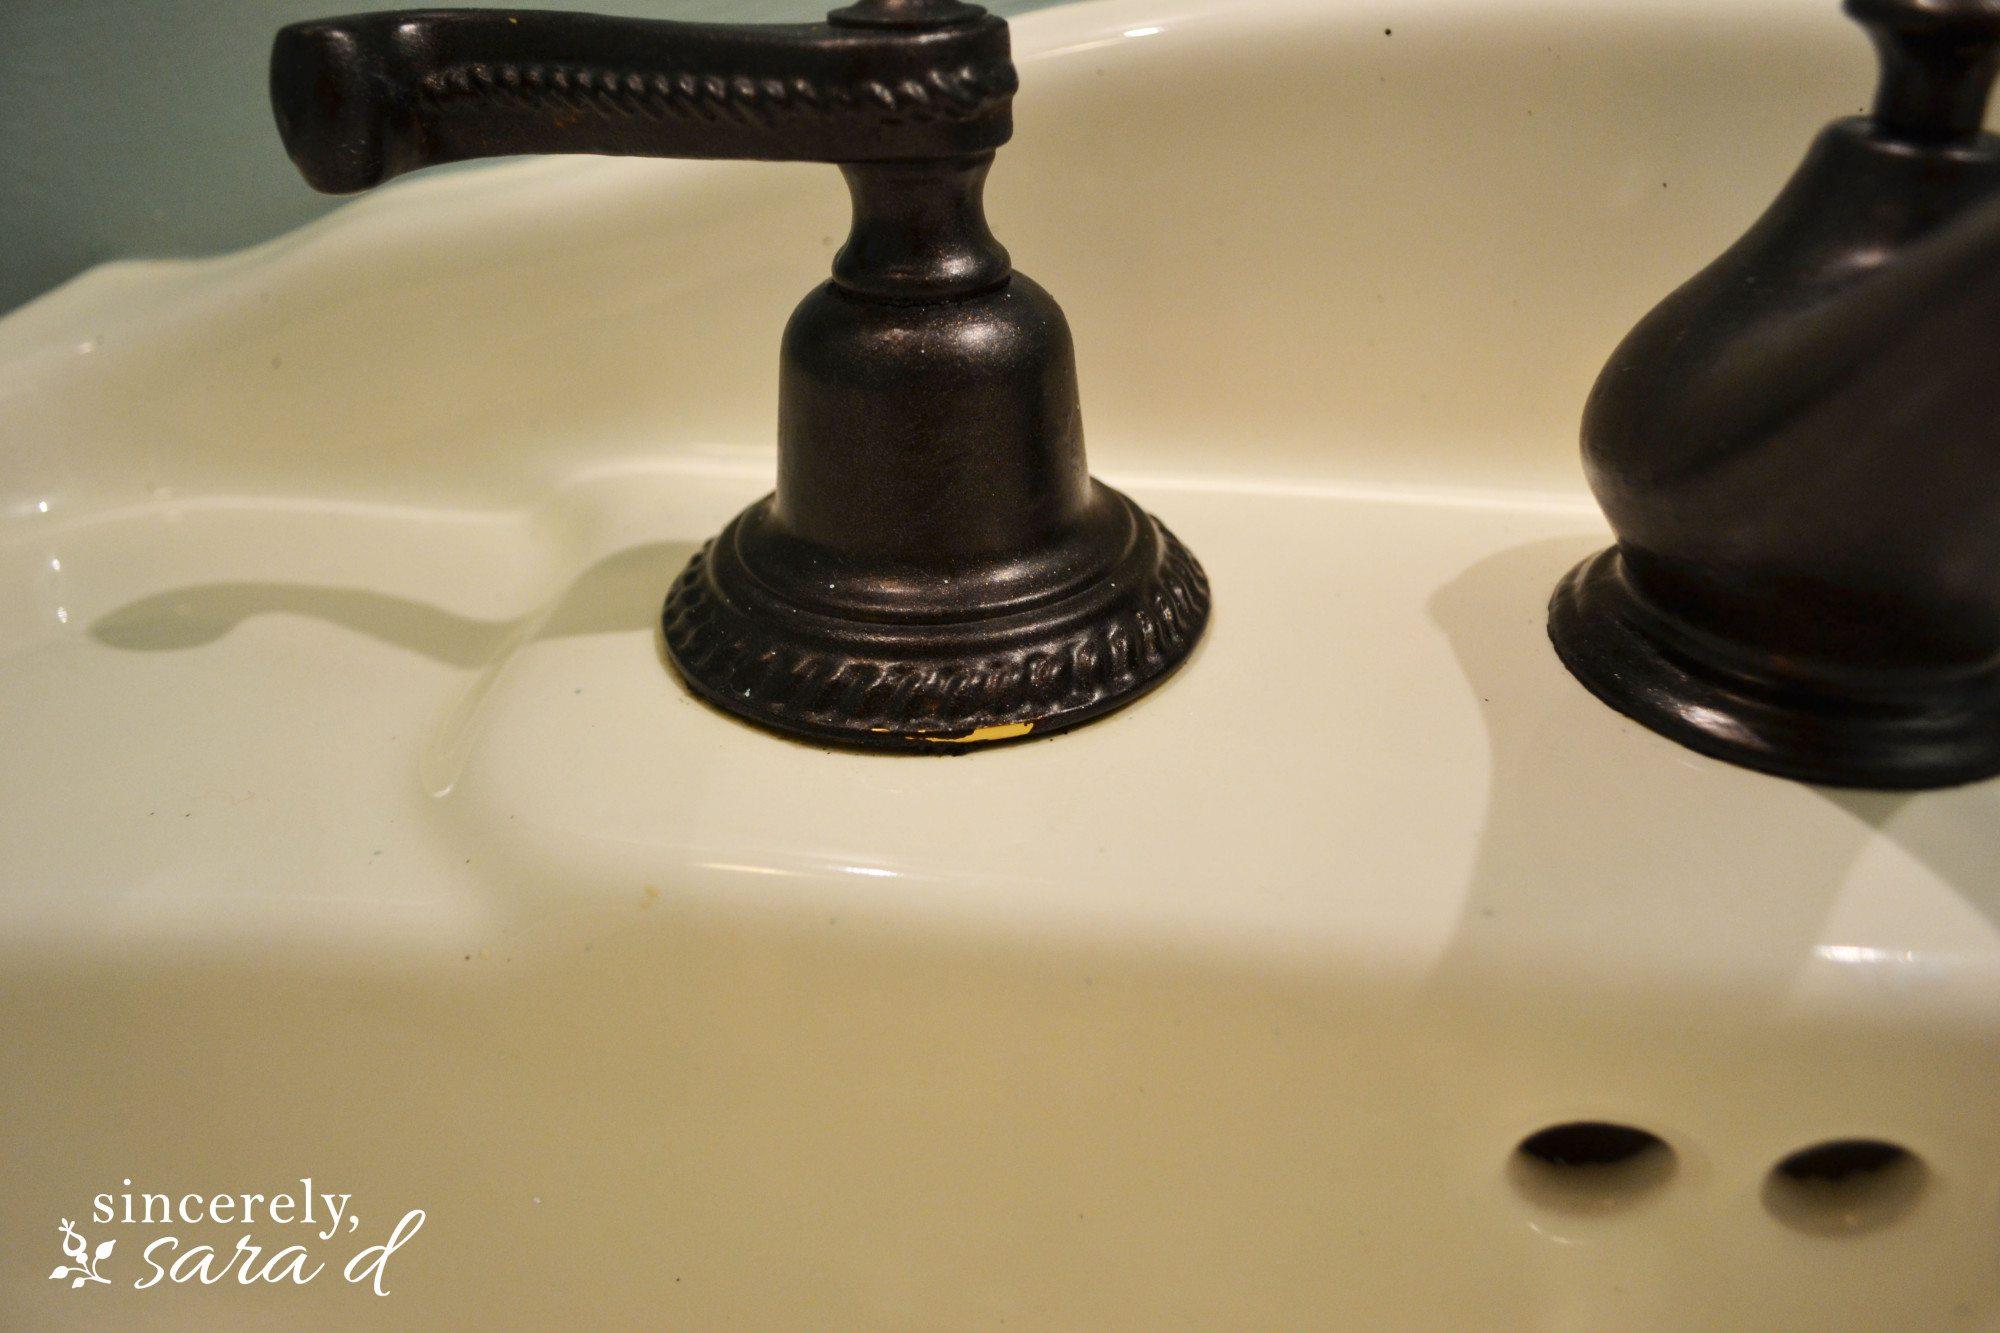 faucet update 9